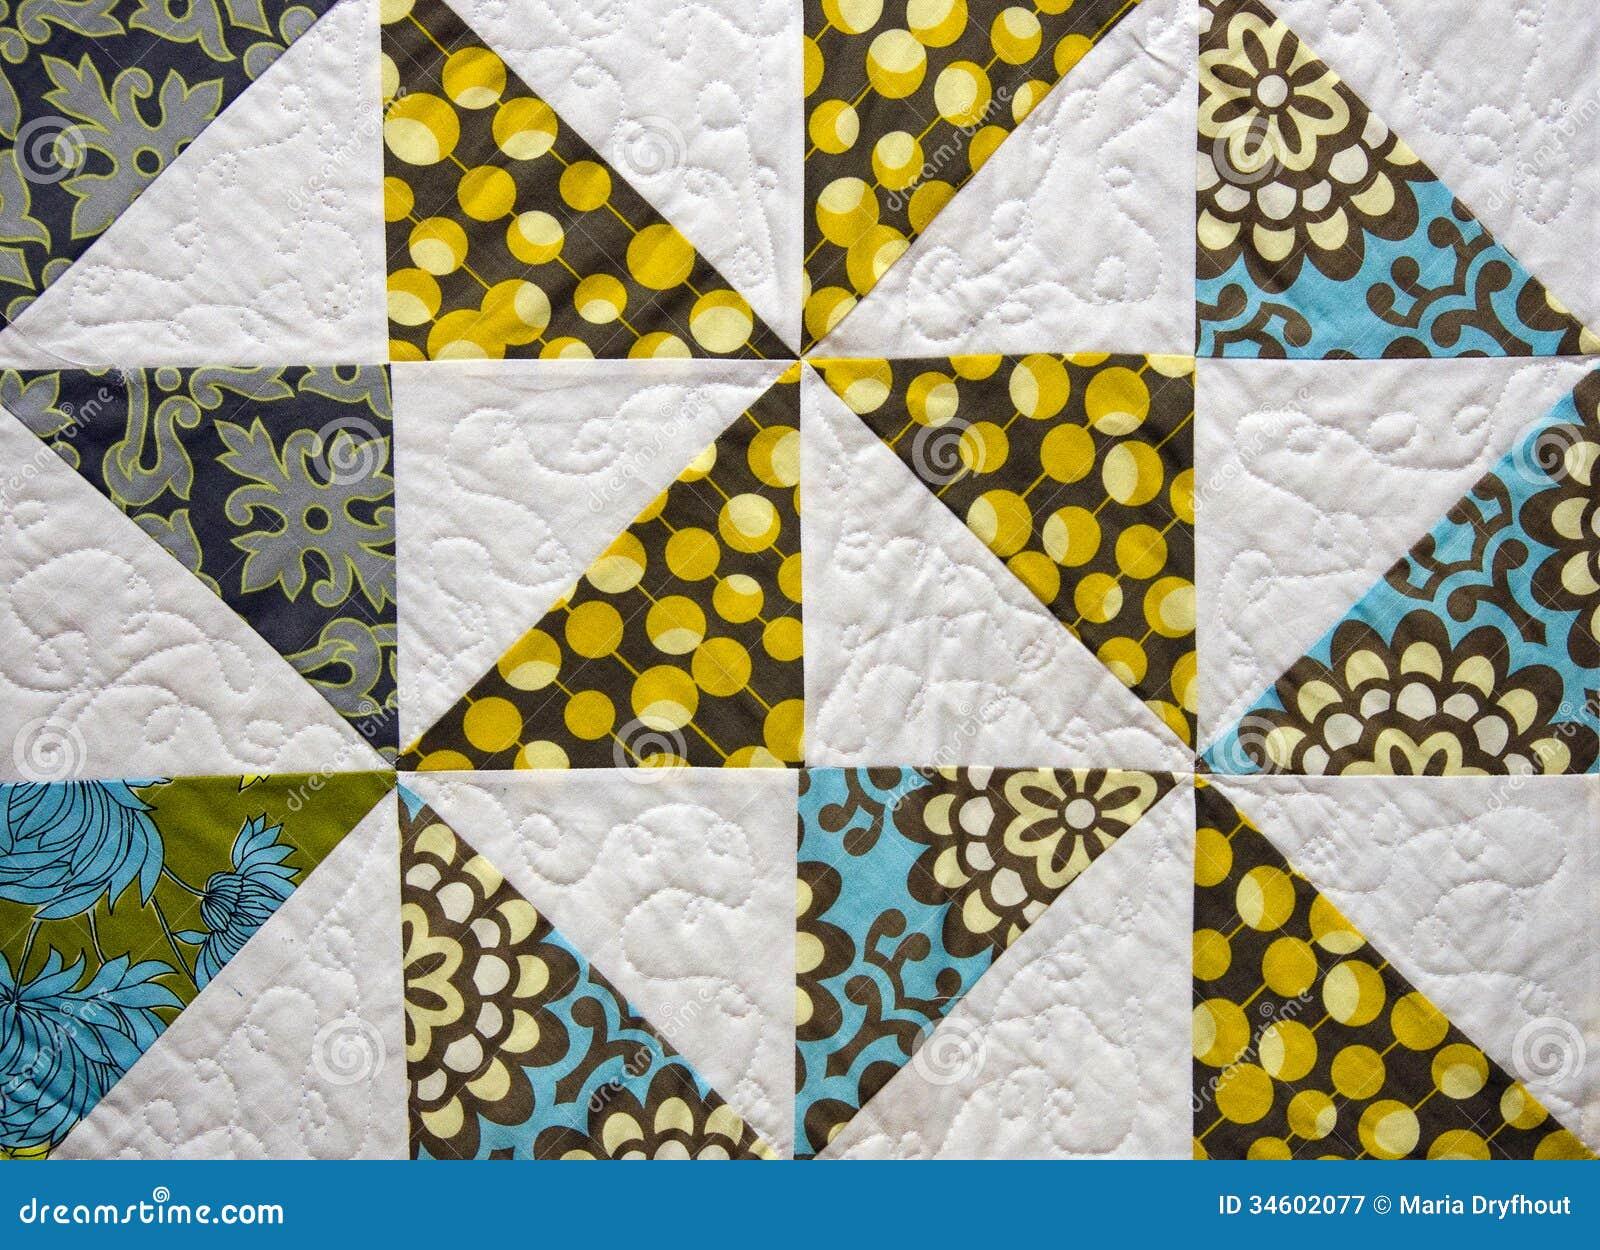 Vintage Star Quilt Pattern Hot Girls Wallpaper